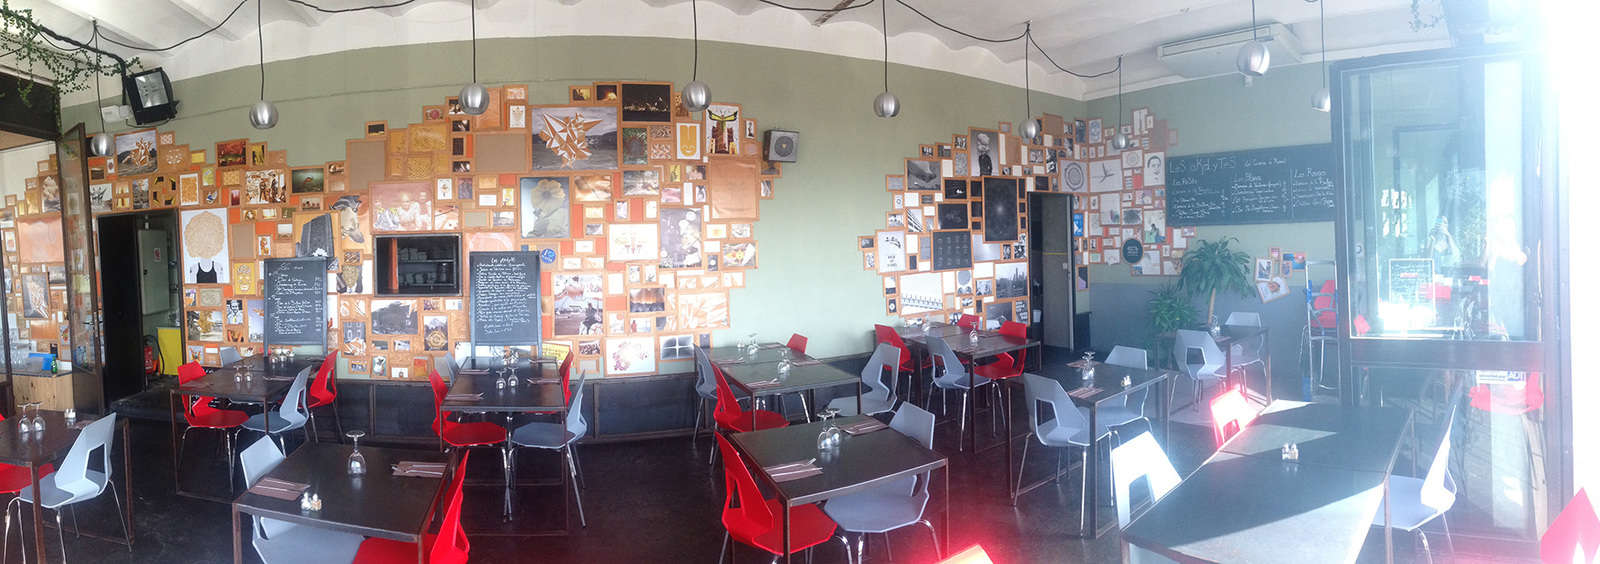 restaurant-tapas-akolytes-catalan